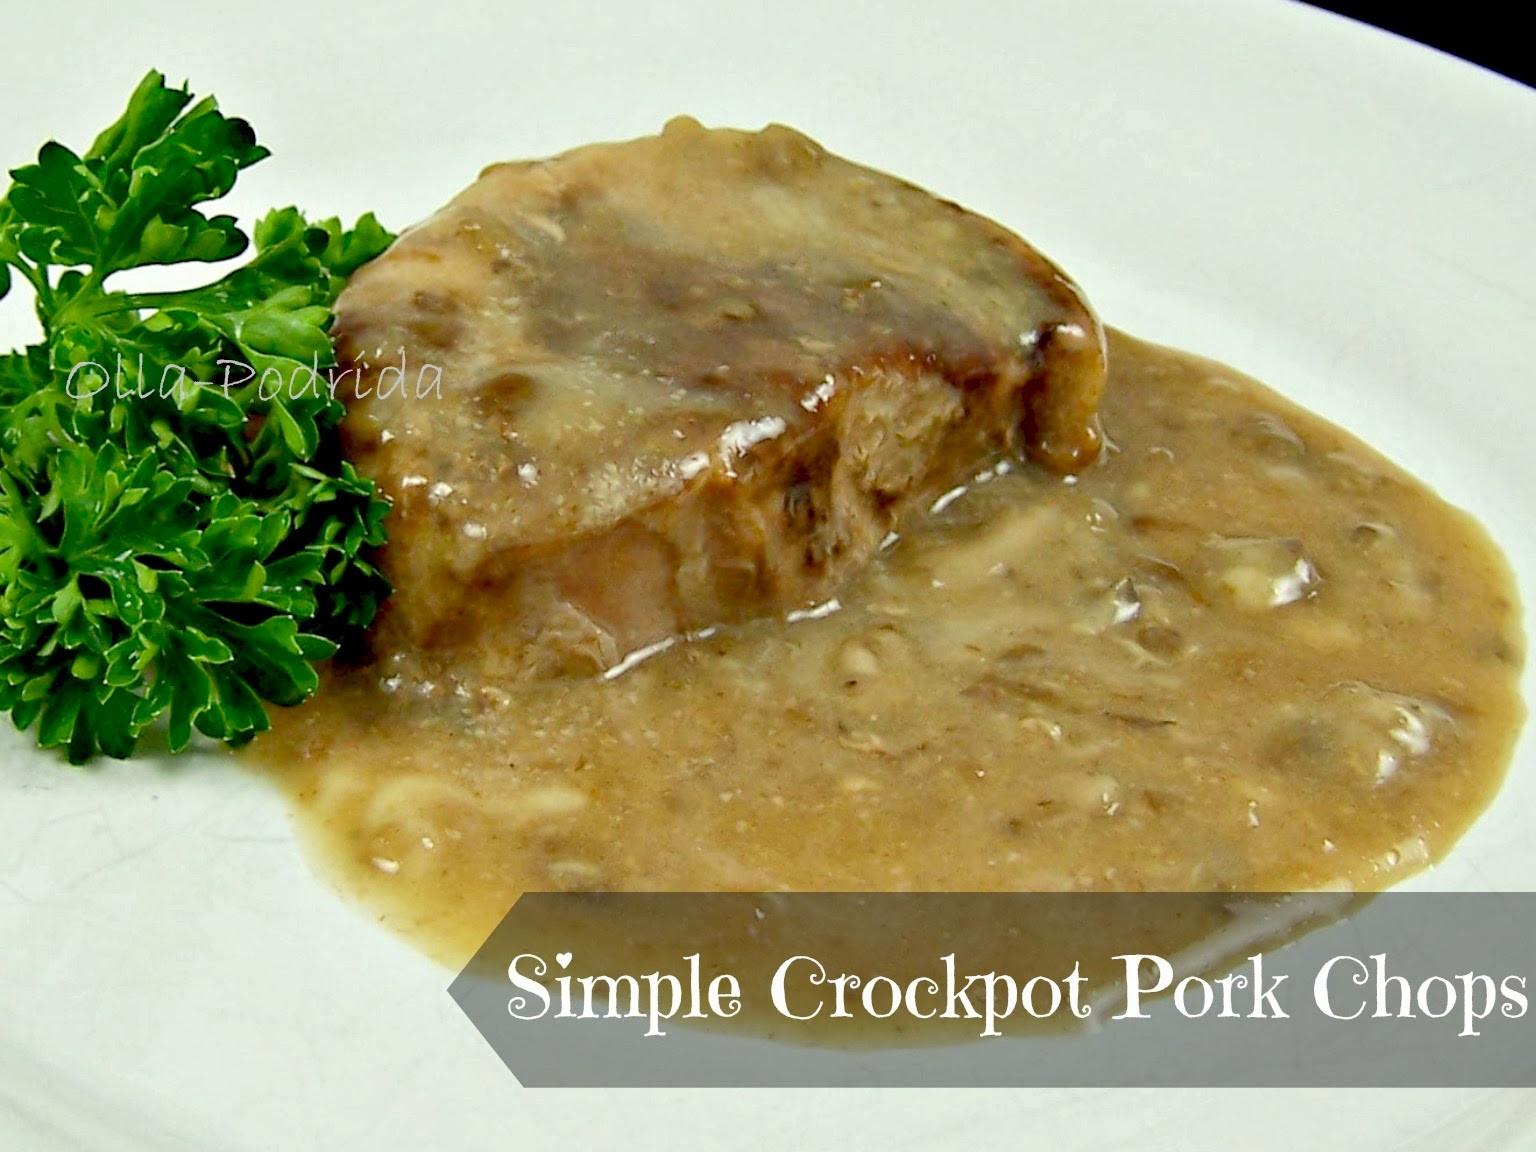 Easy Crockpot Pork Chops  Olla Podrida Simple Crockpot Pork Chops